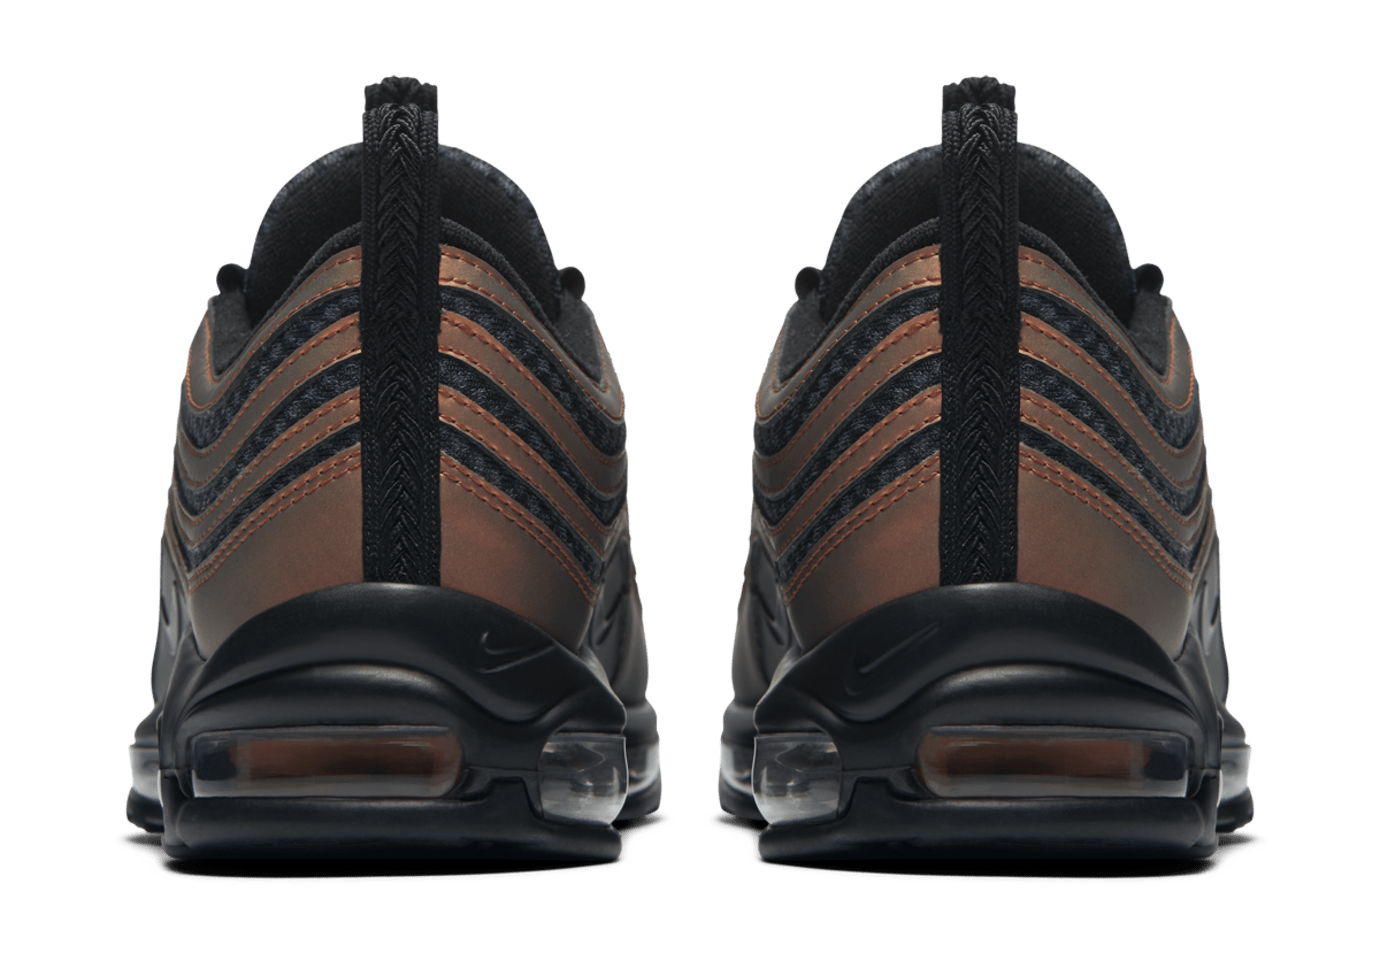 Skepta Nike Air Max 97 AJ1988-900 Heel